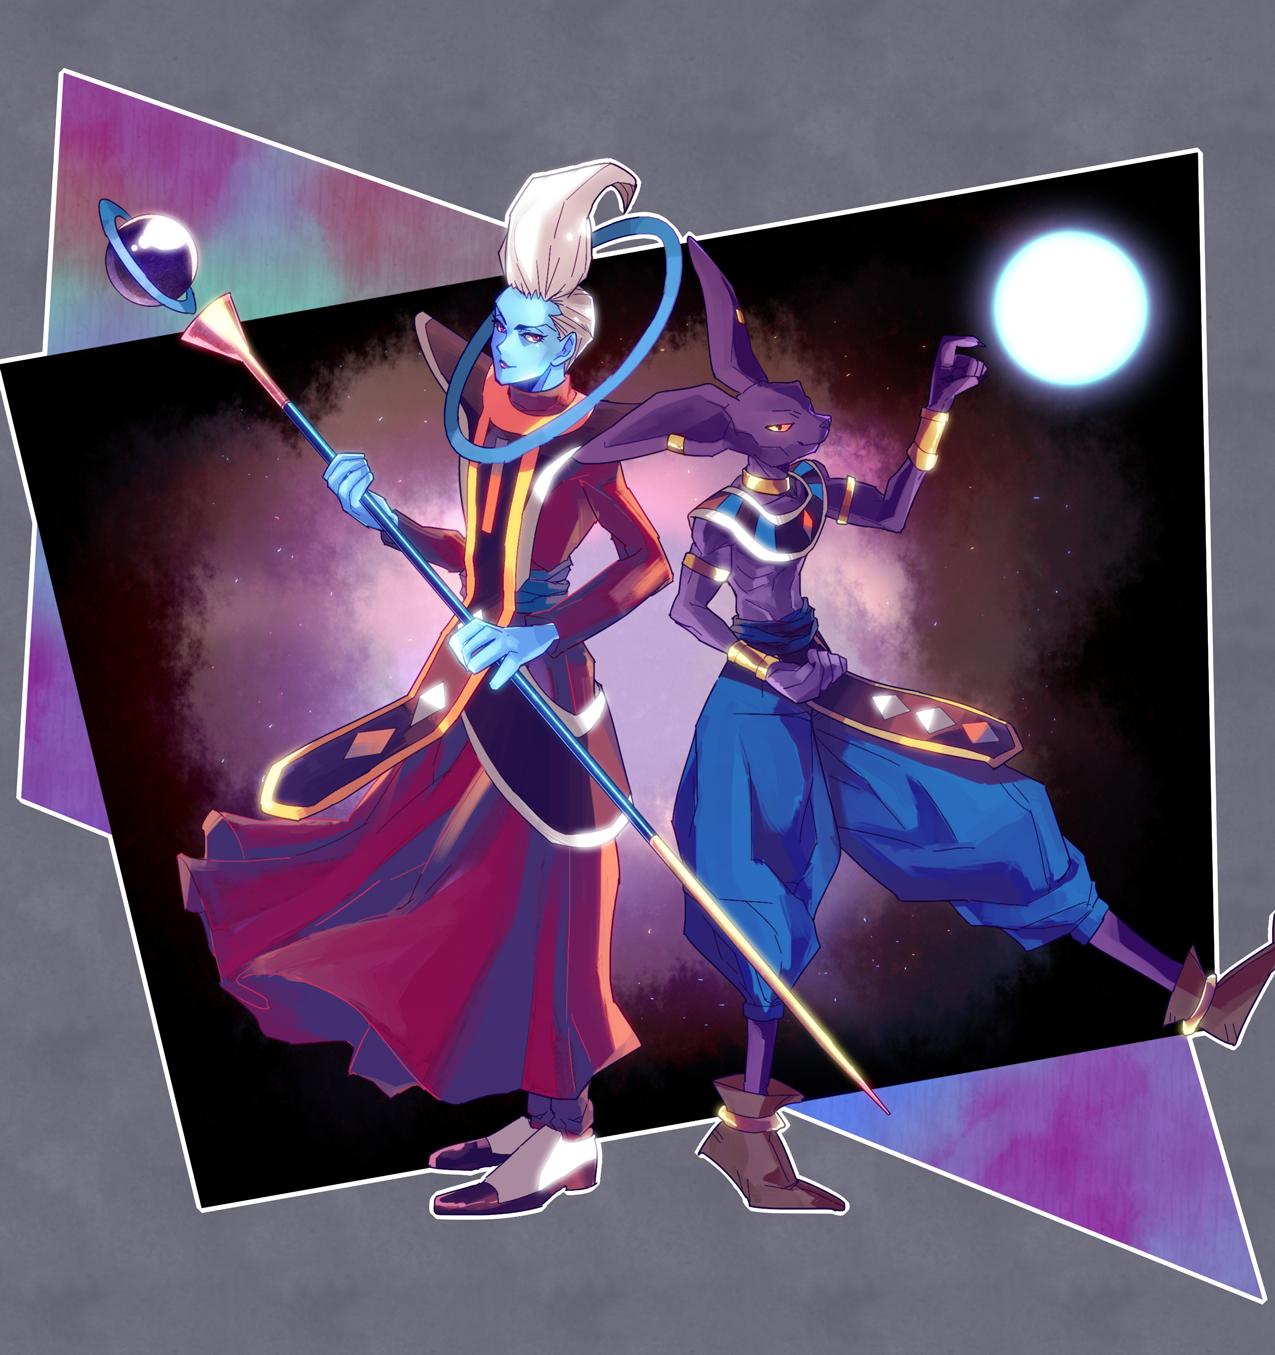 Wallpaper Illustration Anime Dragon Ball Super Toy Whis